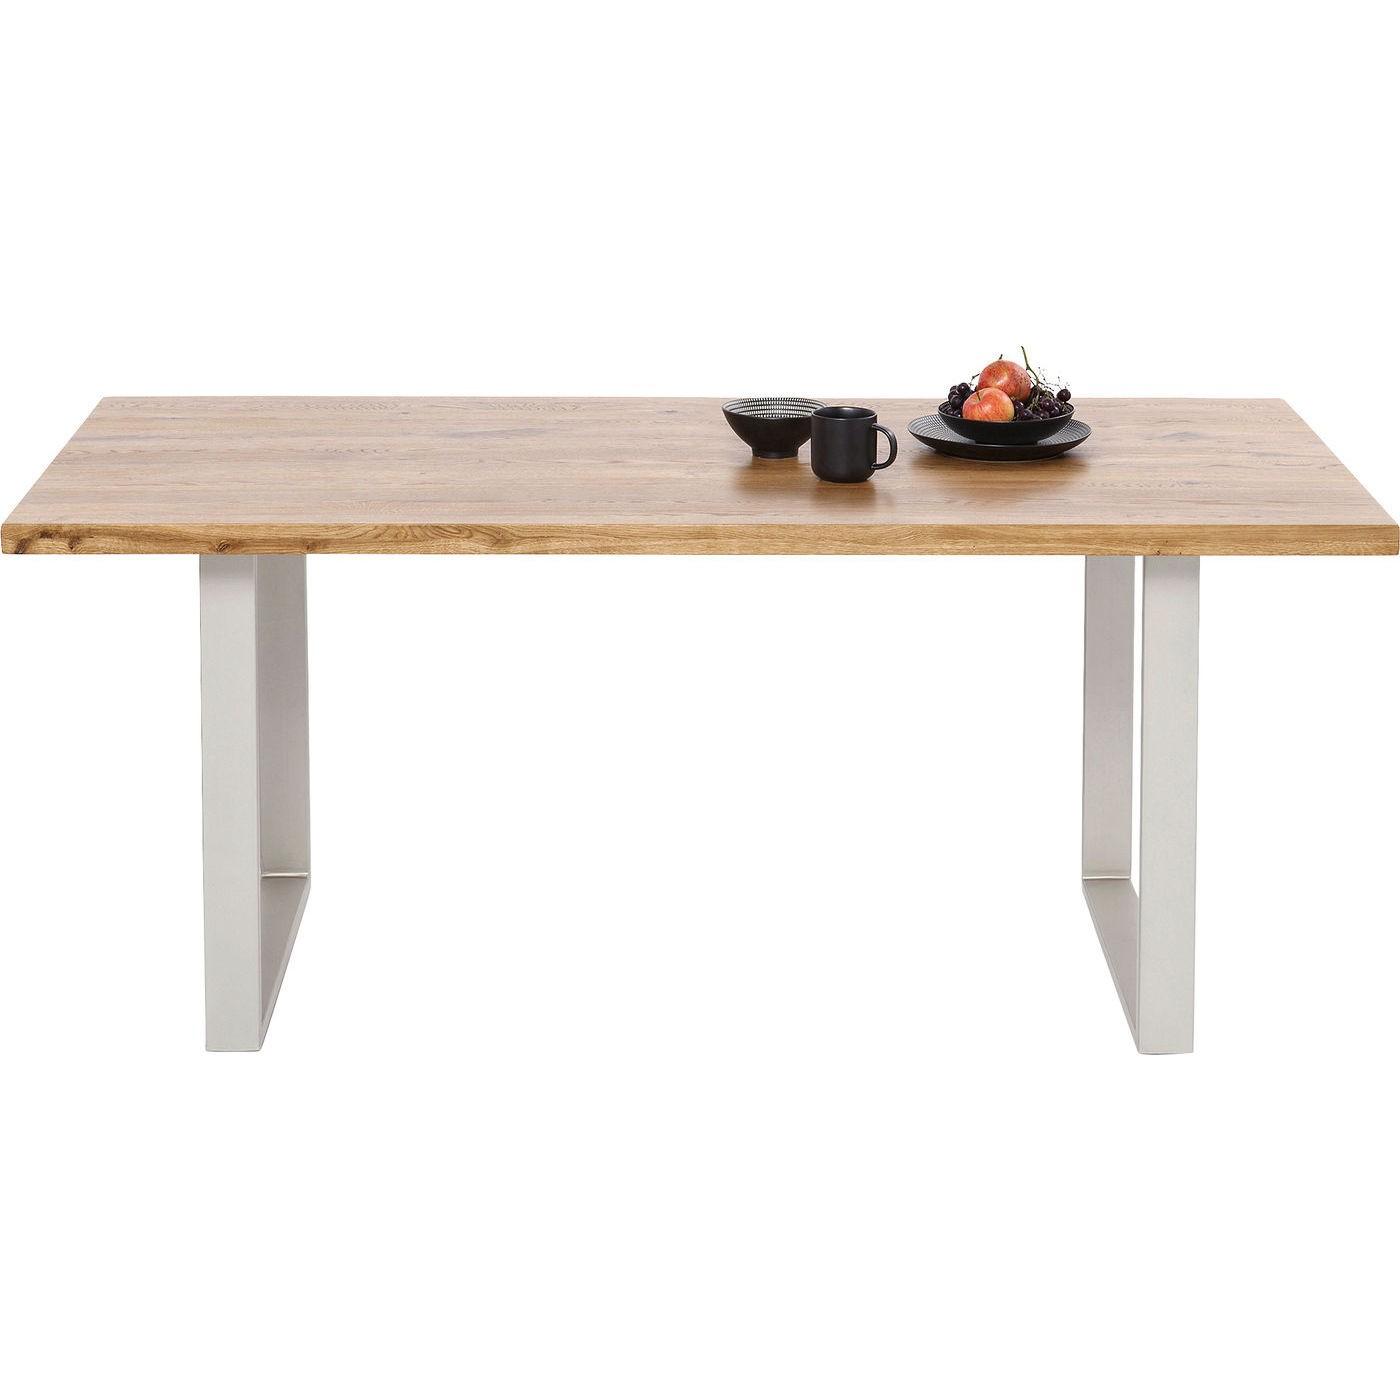 Table Jackie chêne argent 200x100cm Kare Design